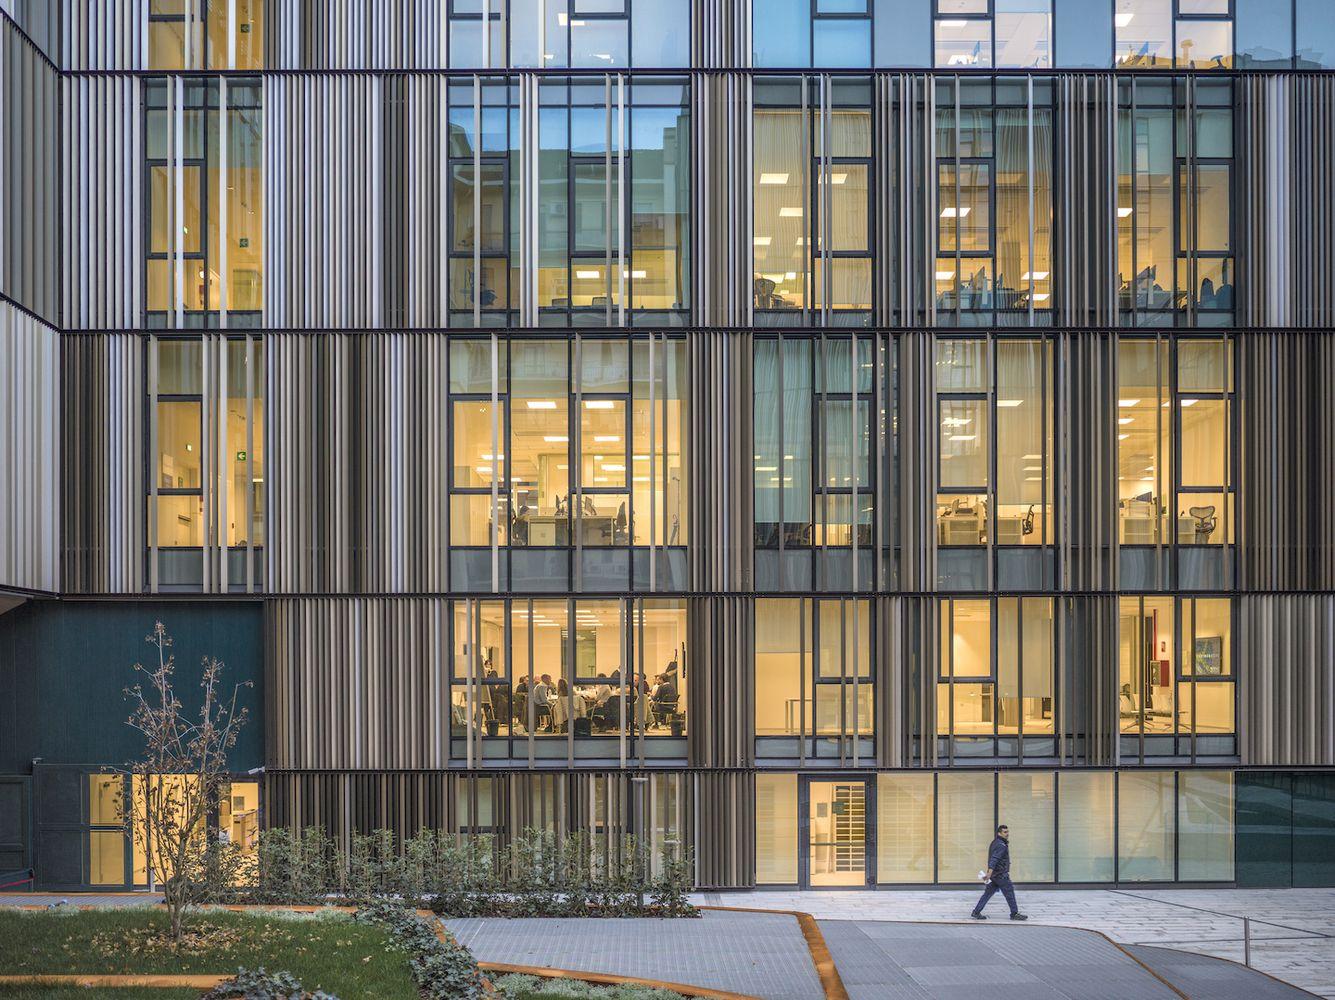 office facades. Gallery Of Reale Group Office Building / Iotti + Pavarani Architetti Artecna - 13 Facades T